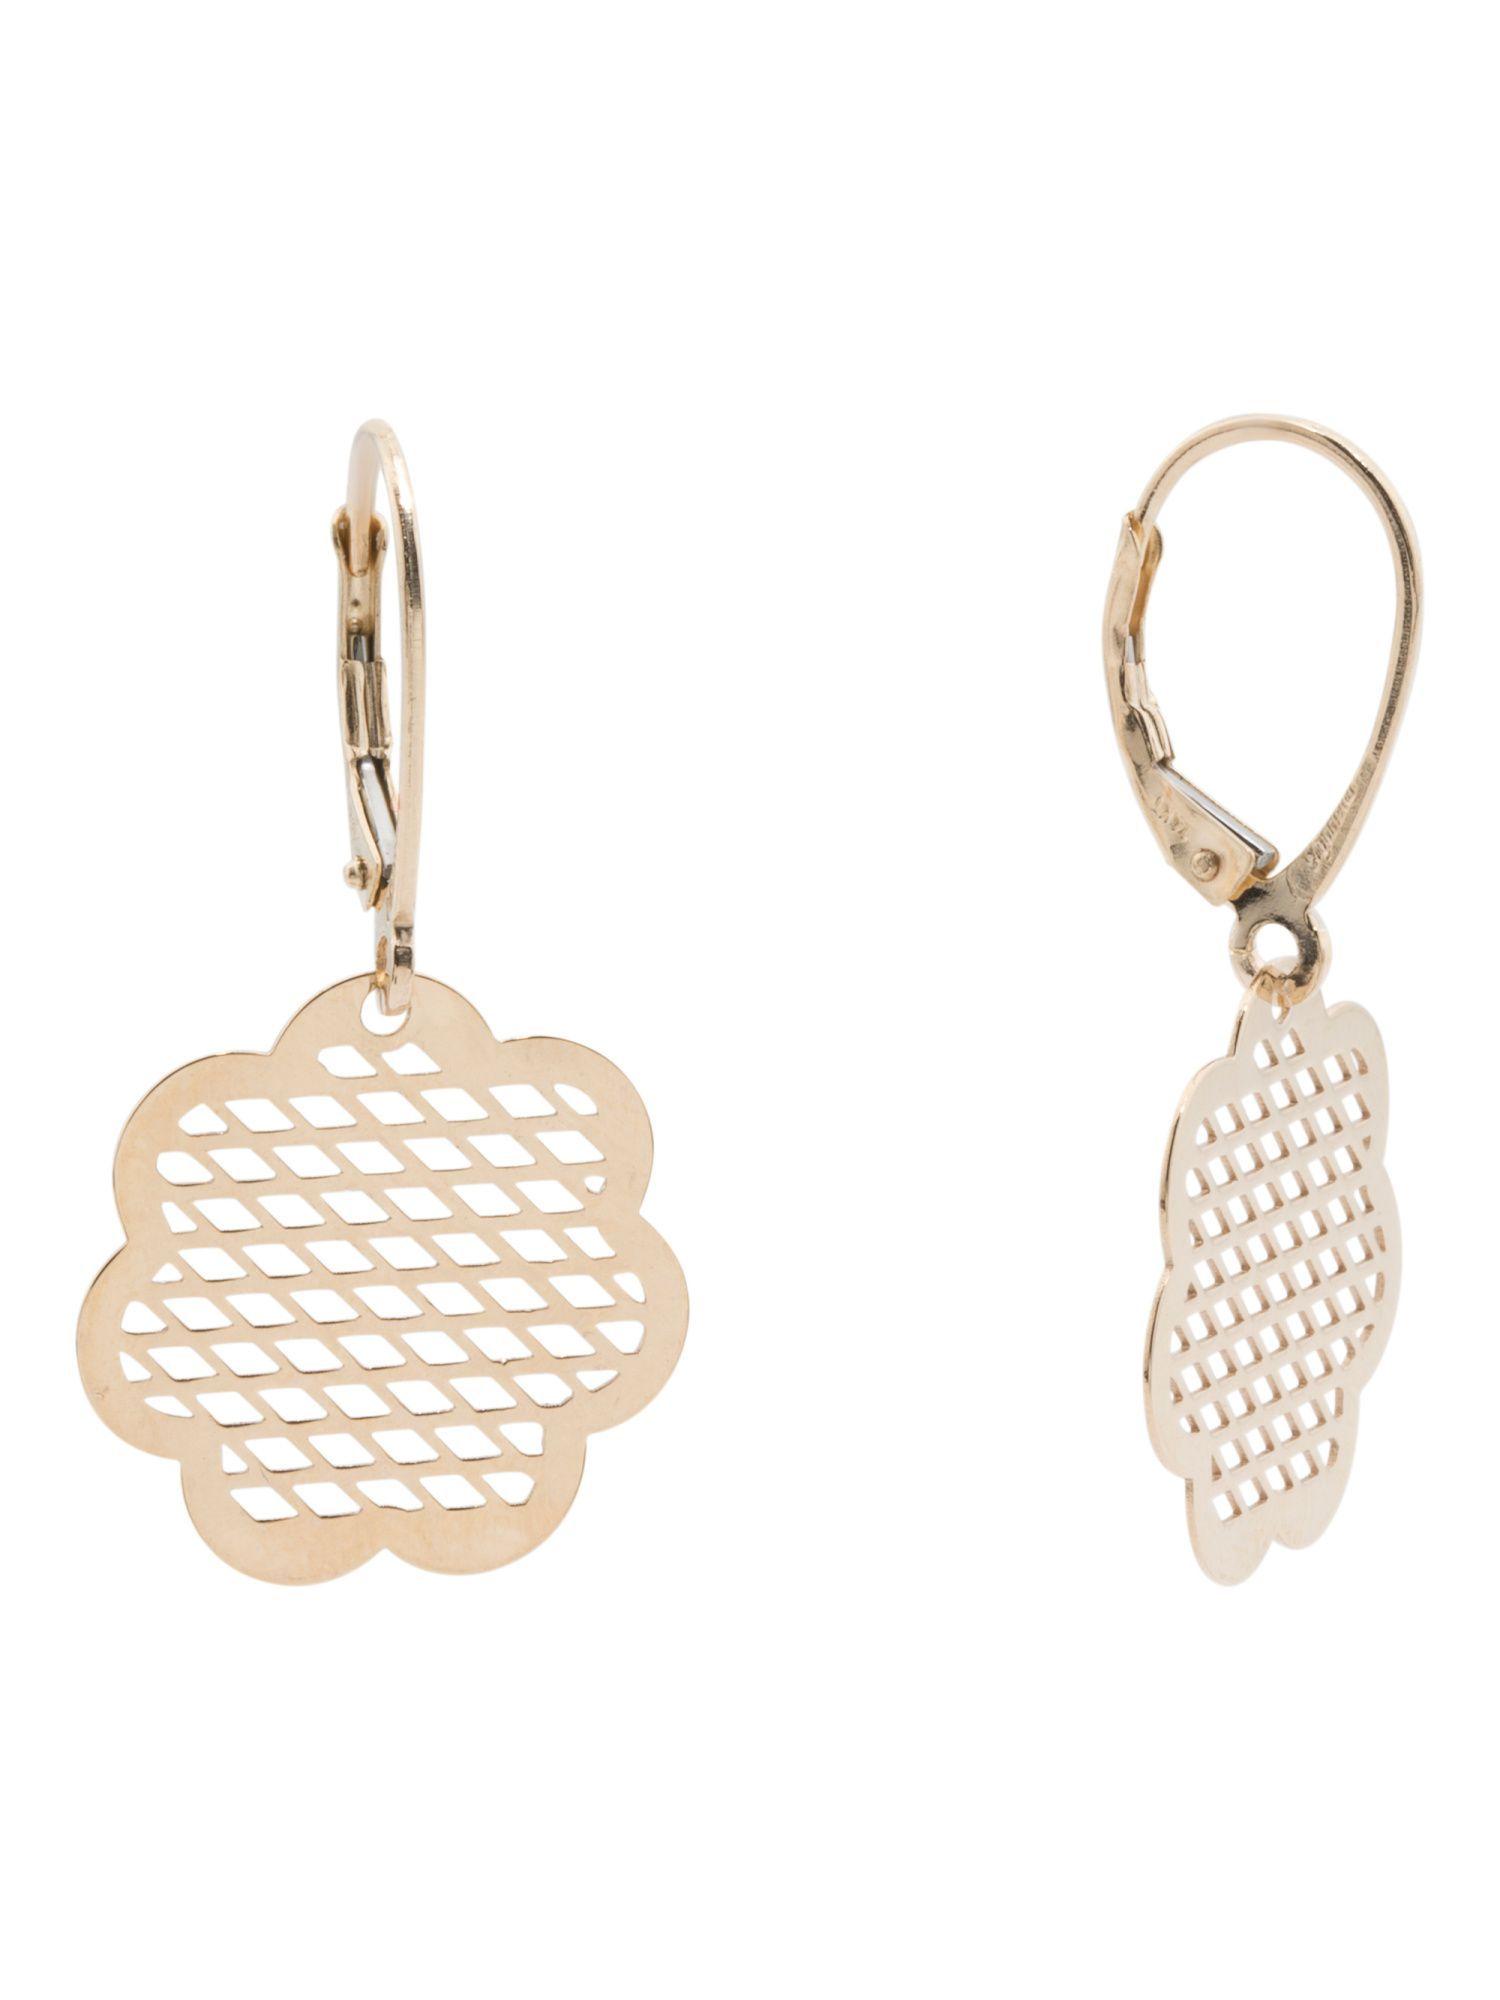 Made In Italy 14k Gold Flower Cutout Diamond Cut Earrings